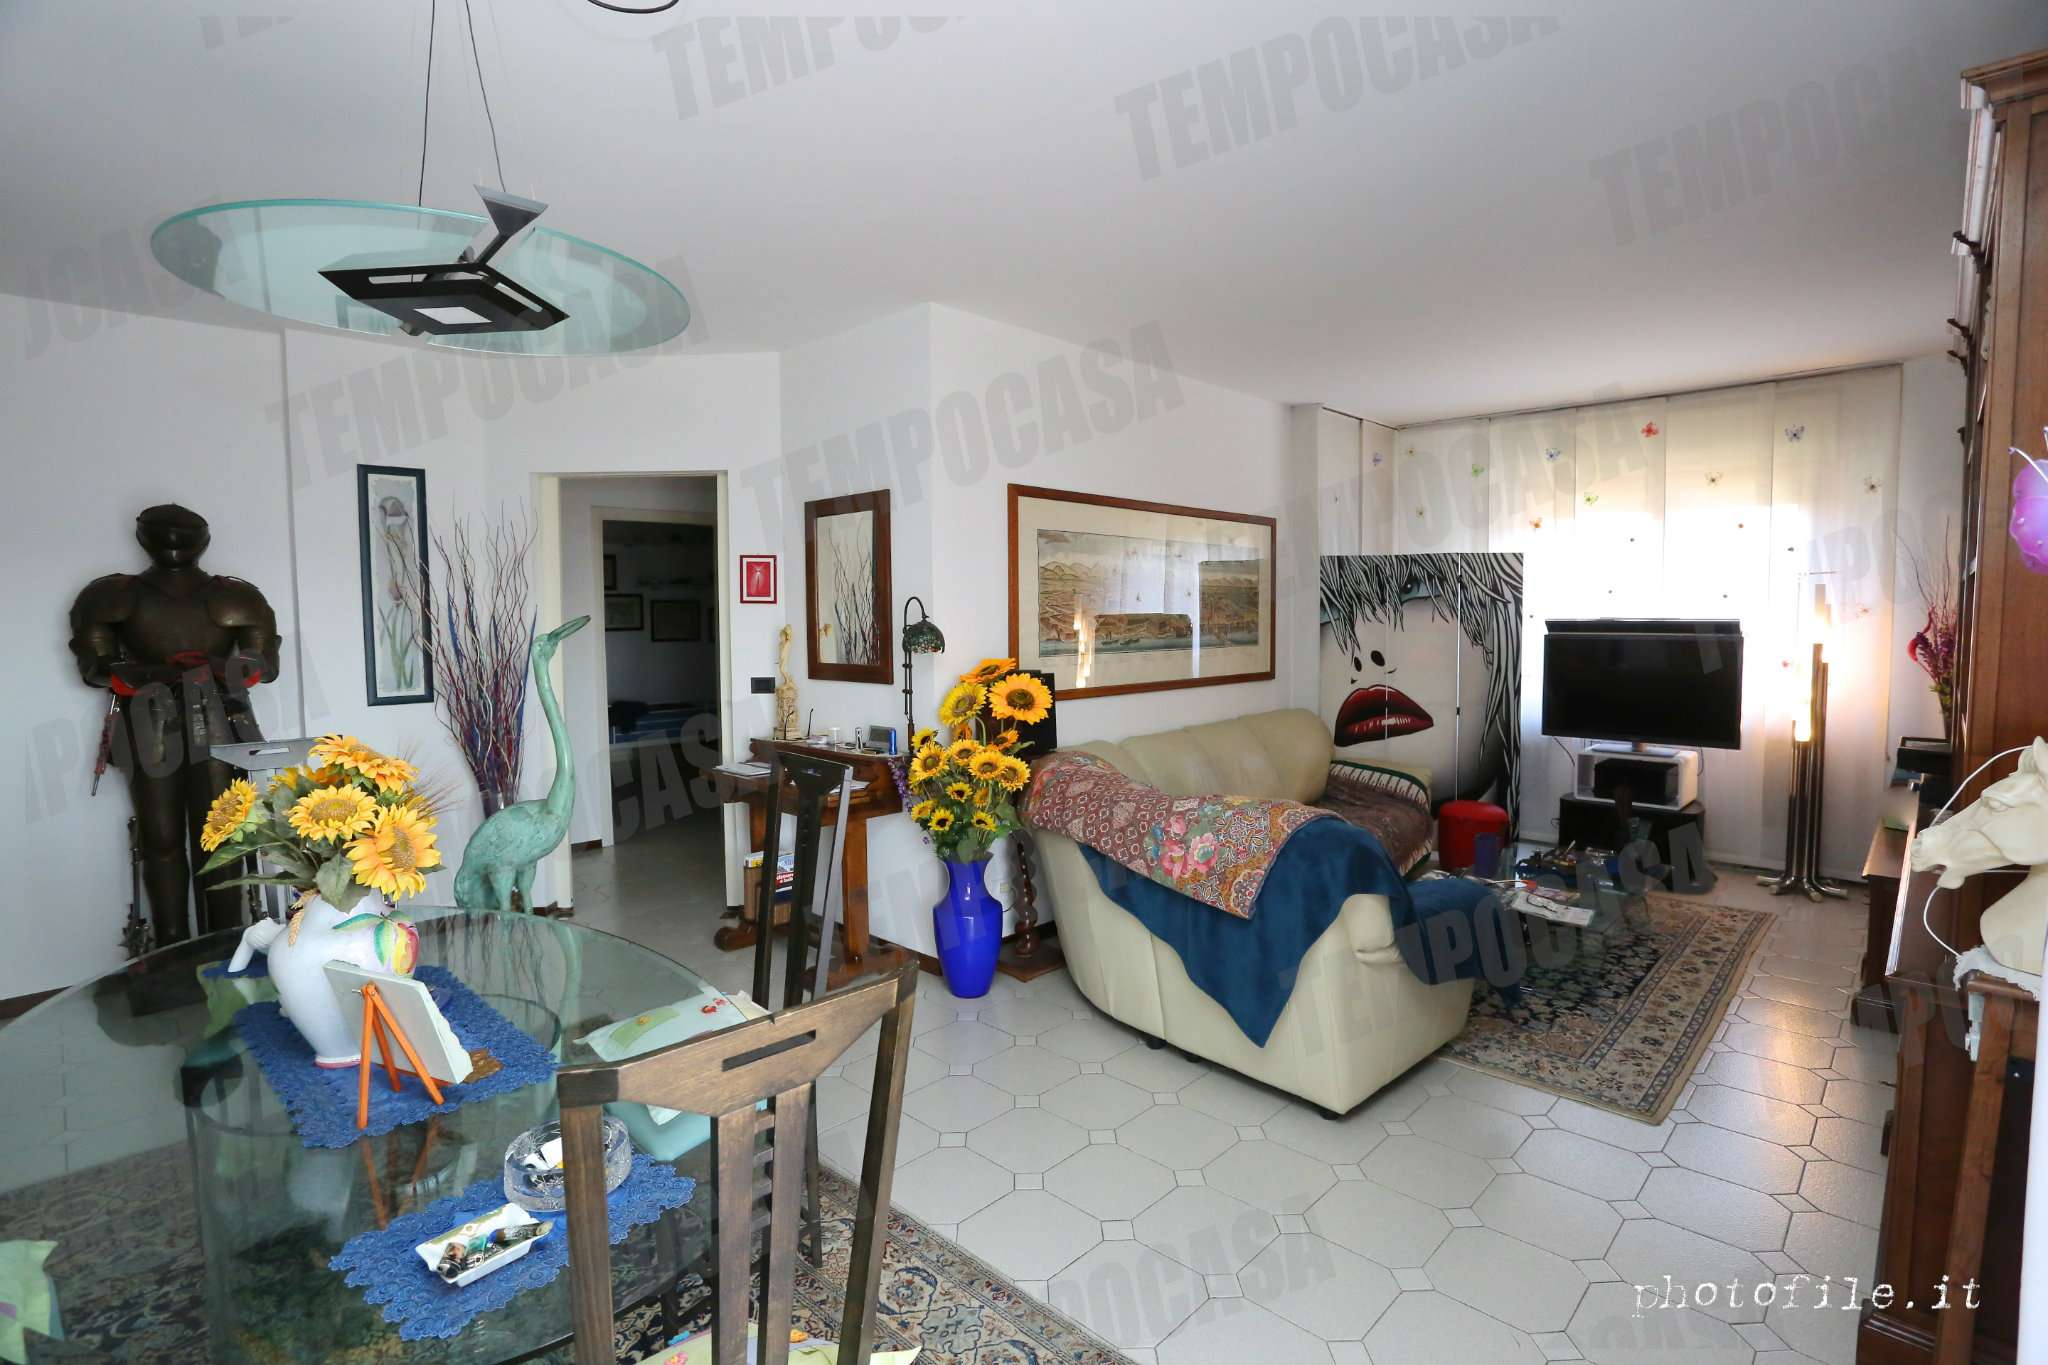 Foto 1 di Appartamento via C.L.N., Grugliasco